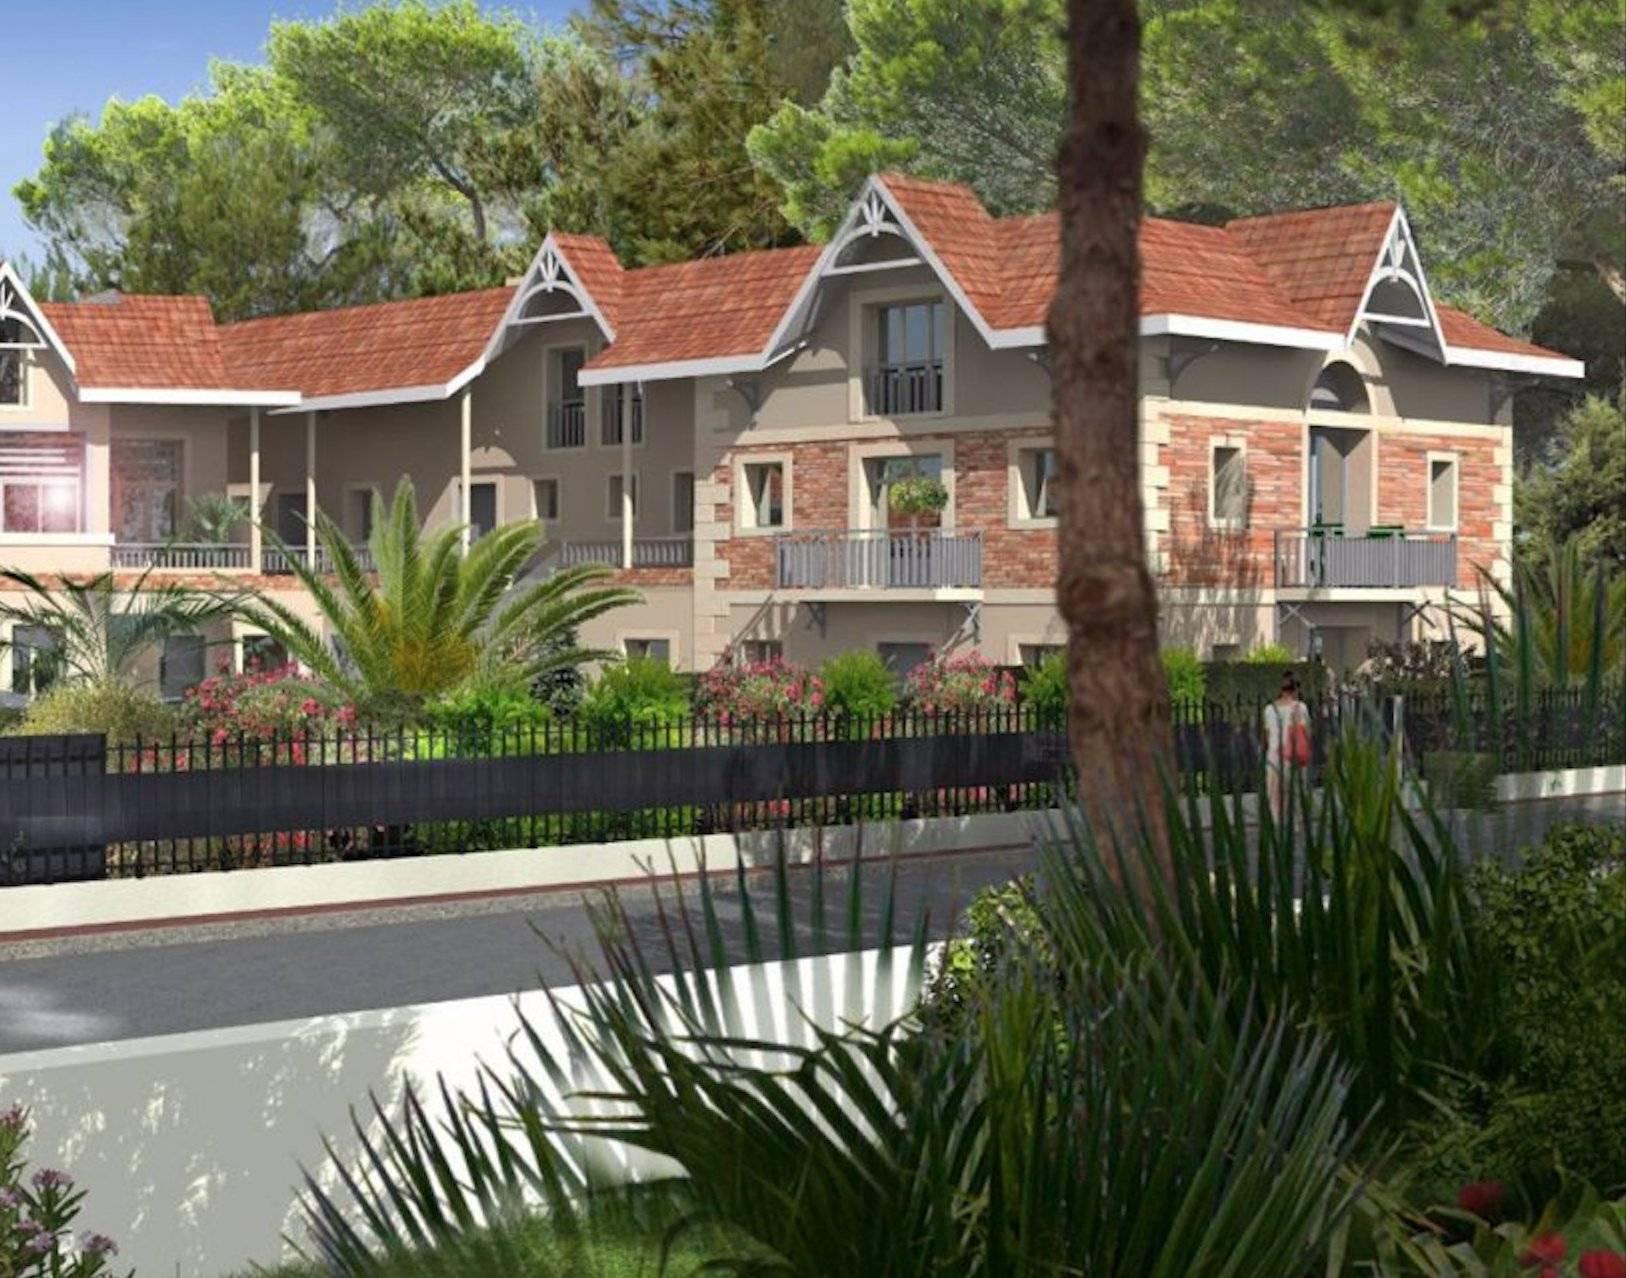 Achat d 39 appartement en programme immobilier neuf for Appartement neuf bordeaux bastide